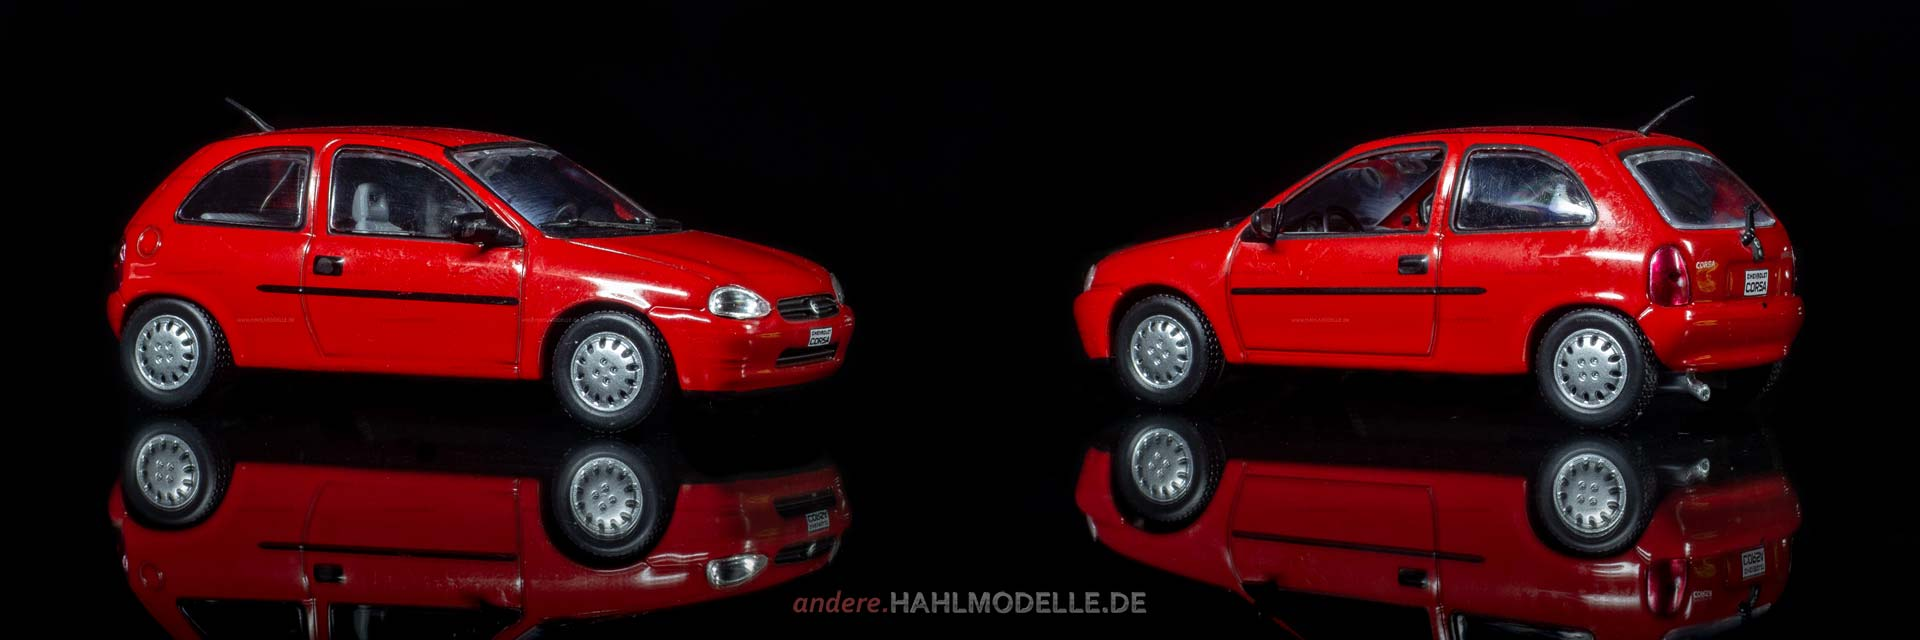 Chevrolet Corsa | Limousine | Ixo | 1:43 | www.andere.hahlmodelle.de